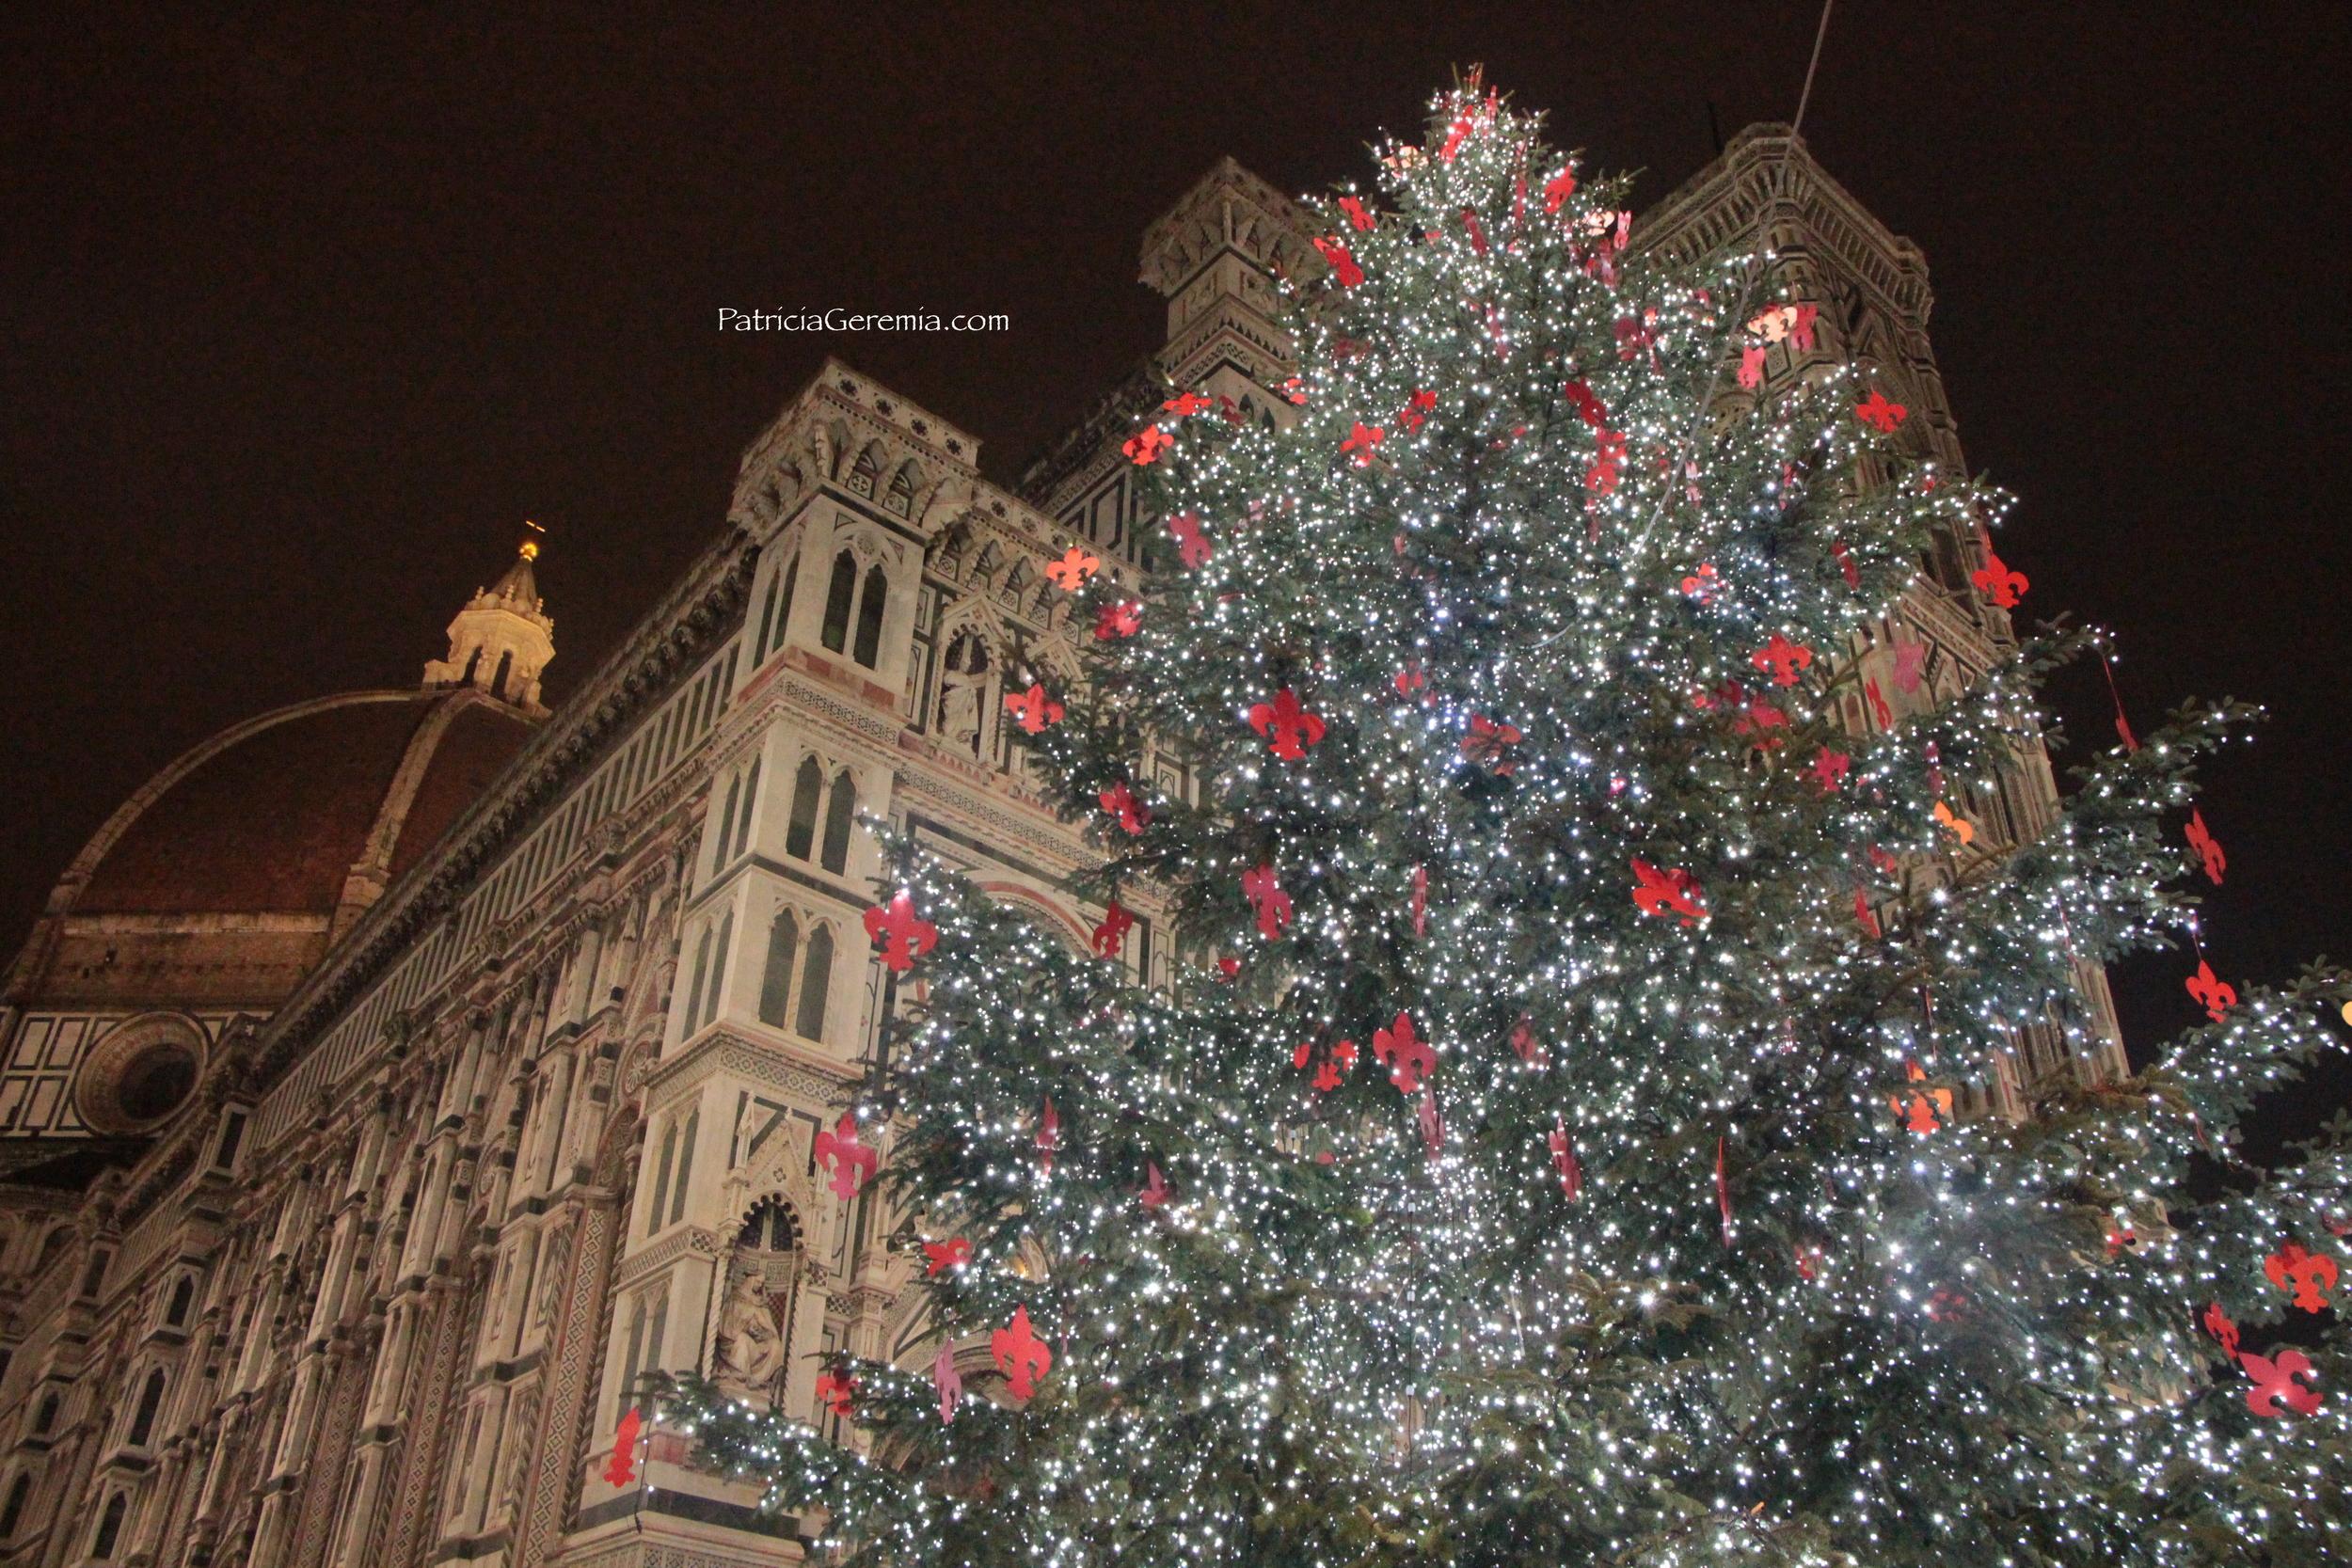 Firenze Christmas tree wm.jpg